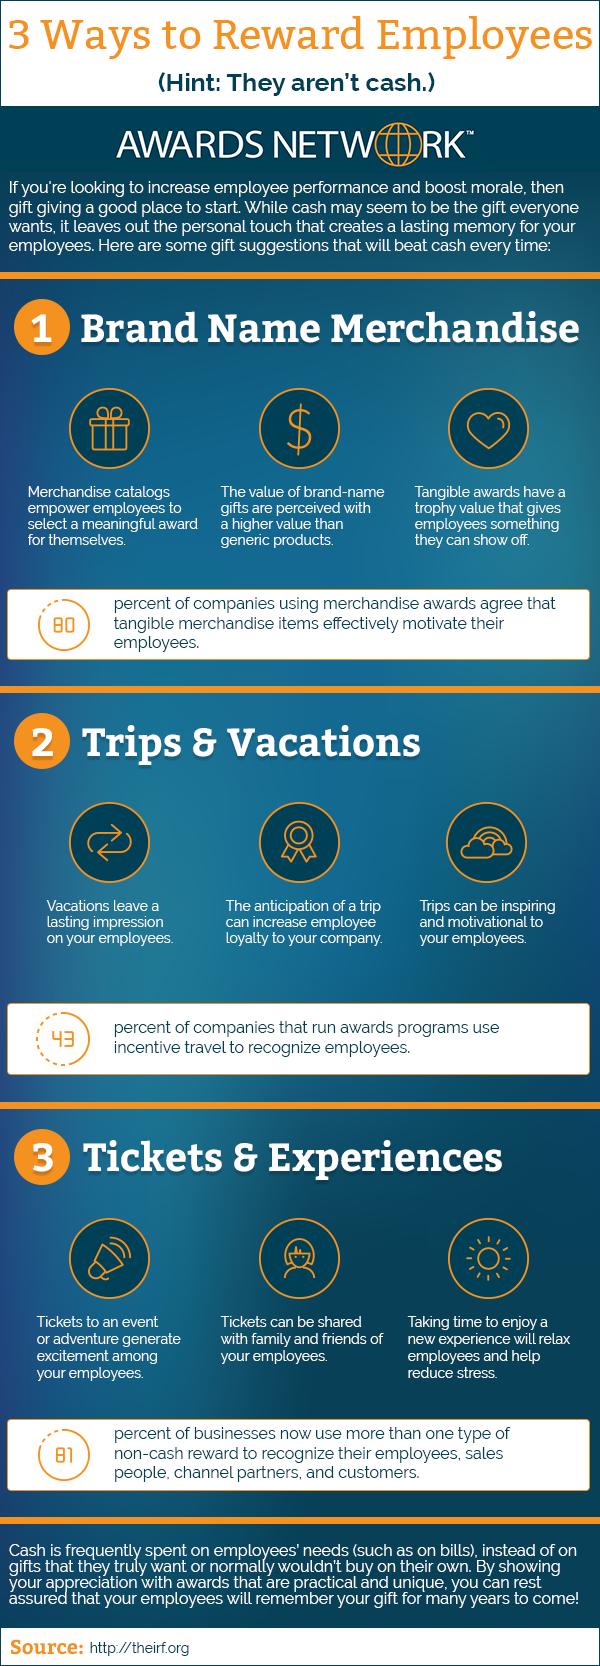 3 Ways to Reward Employees that aren't Cash - Infographic